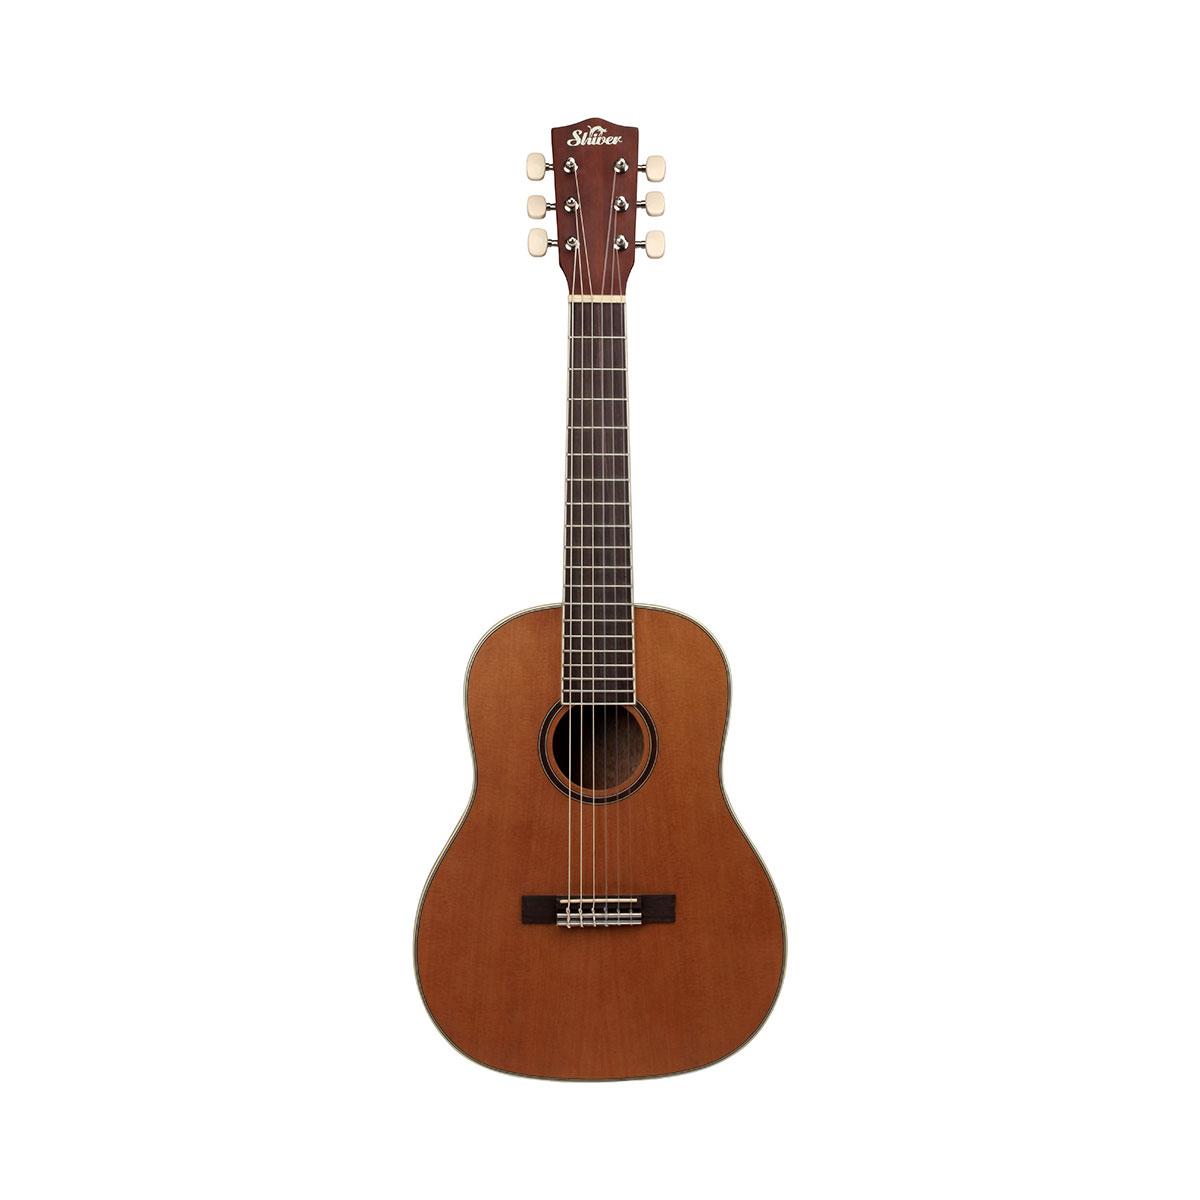 Shiver - Guitario GLS-50 - Naturel